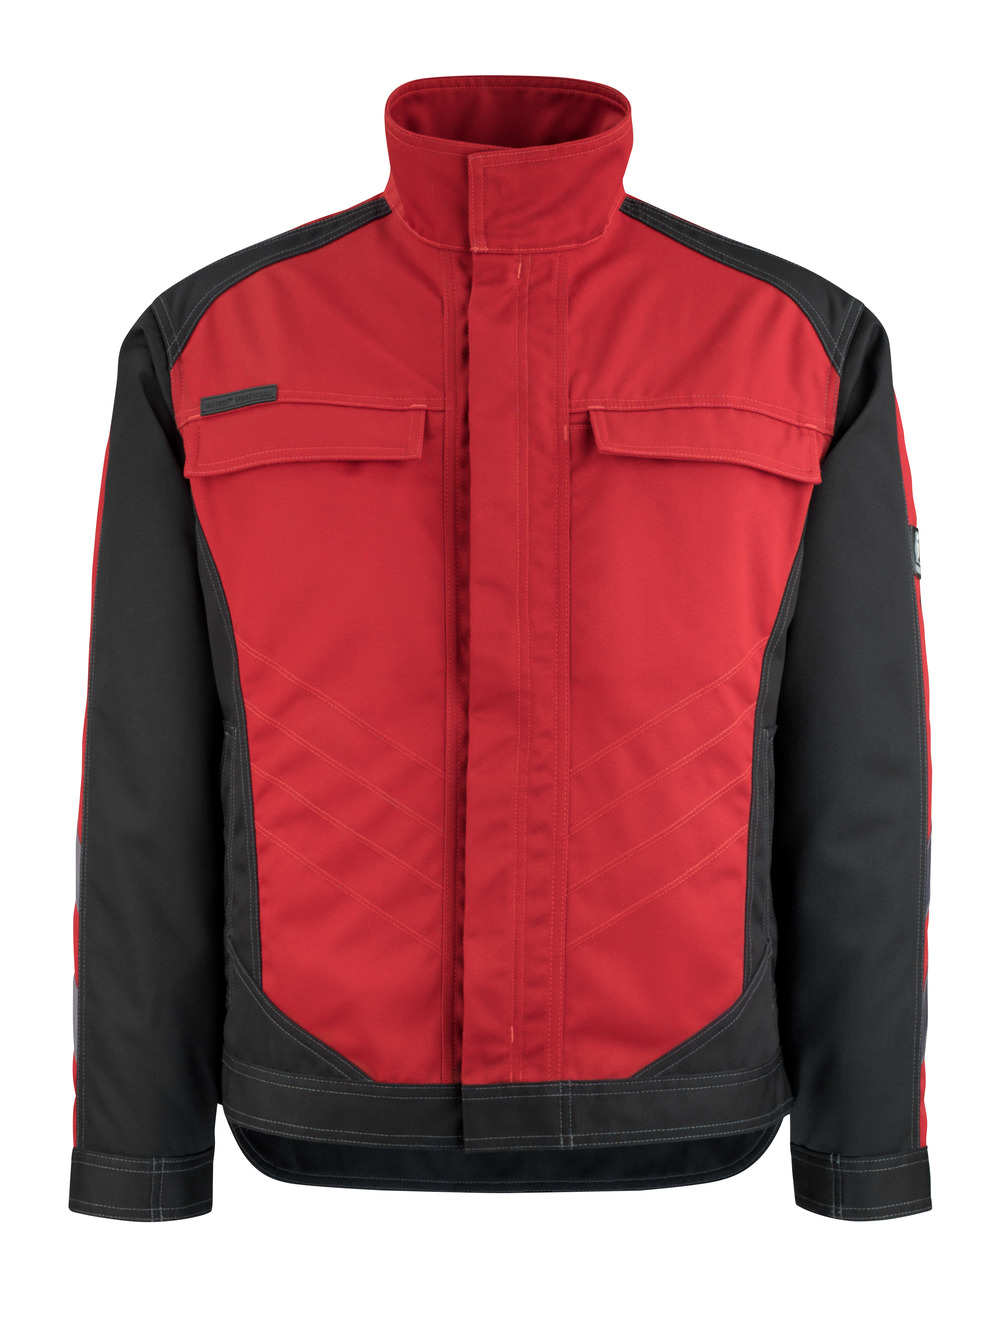 12009-203-0209 Chaqueta - rojo/negro